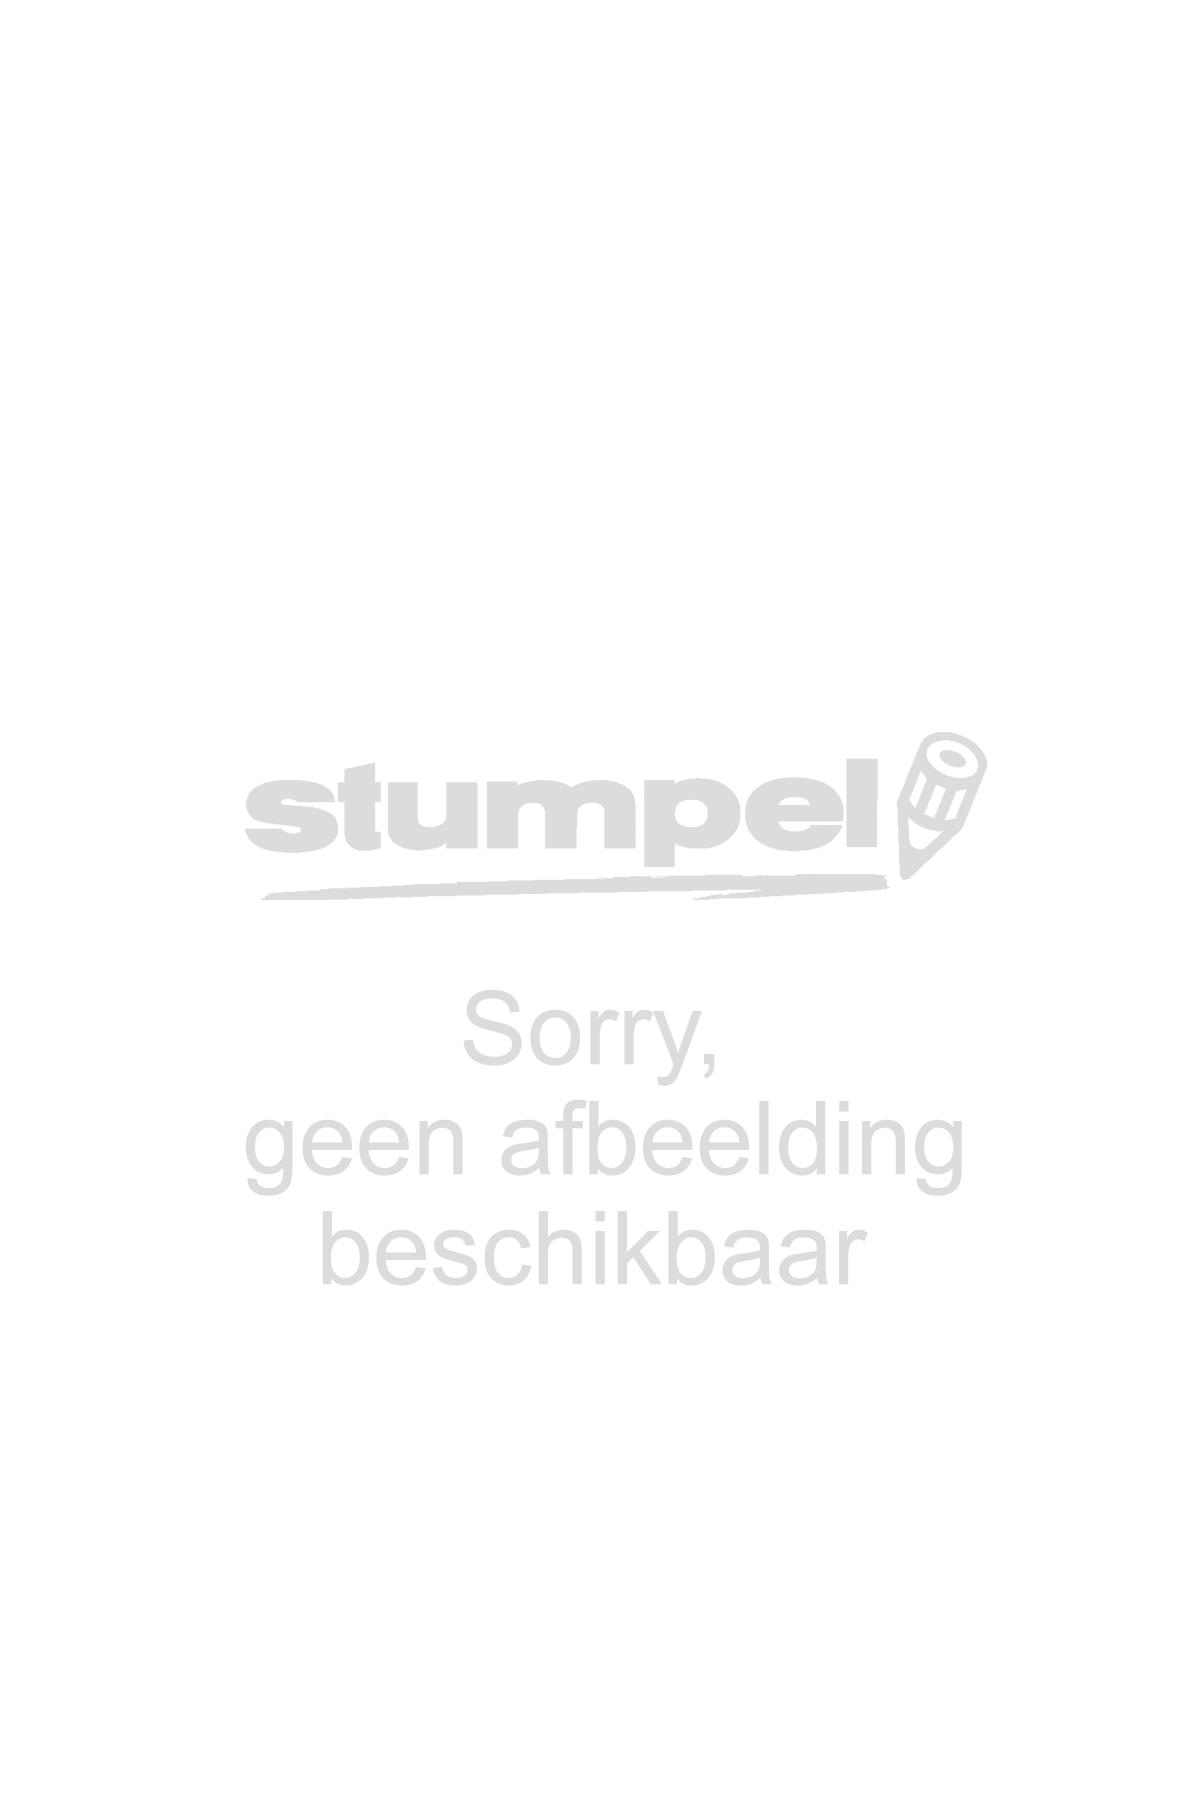 scheurkalender-2021-21-new-yorker-cartoons-amp-11015376